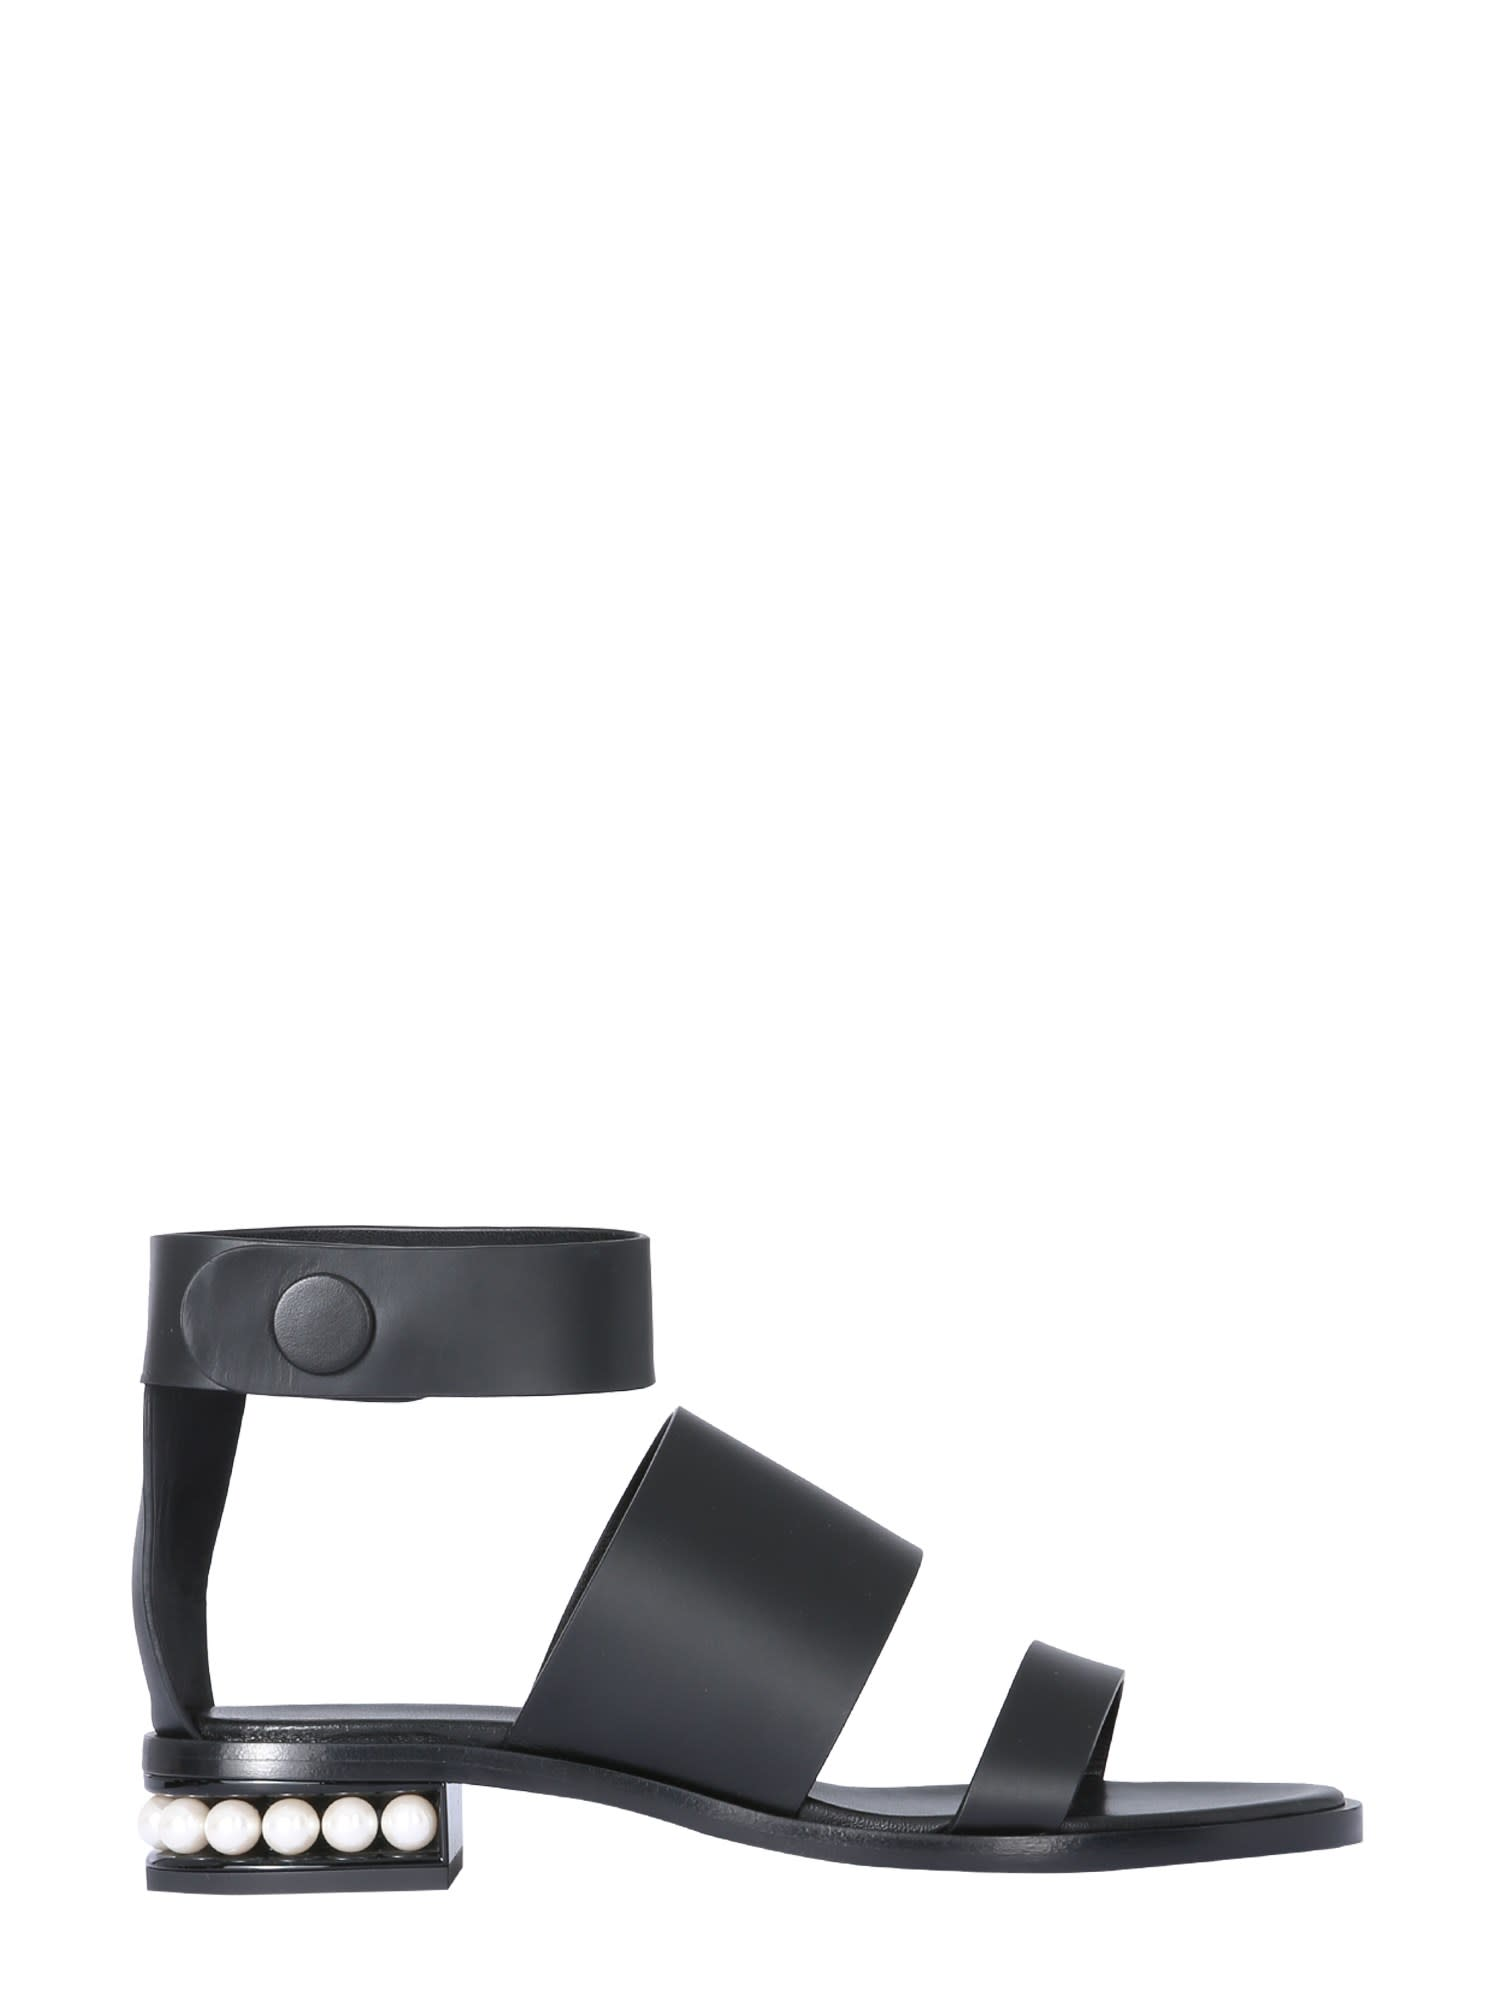 Buy Nicholas Kirkwood Casati Leather Sandal online, shop Nicholas Kirkwood shoes with free shipping